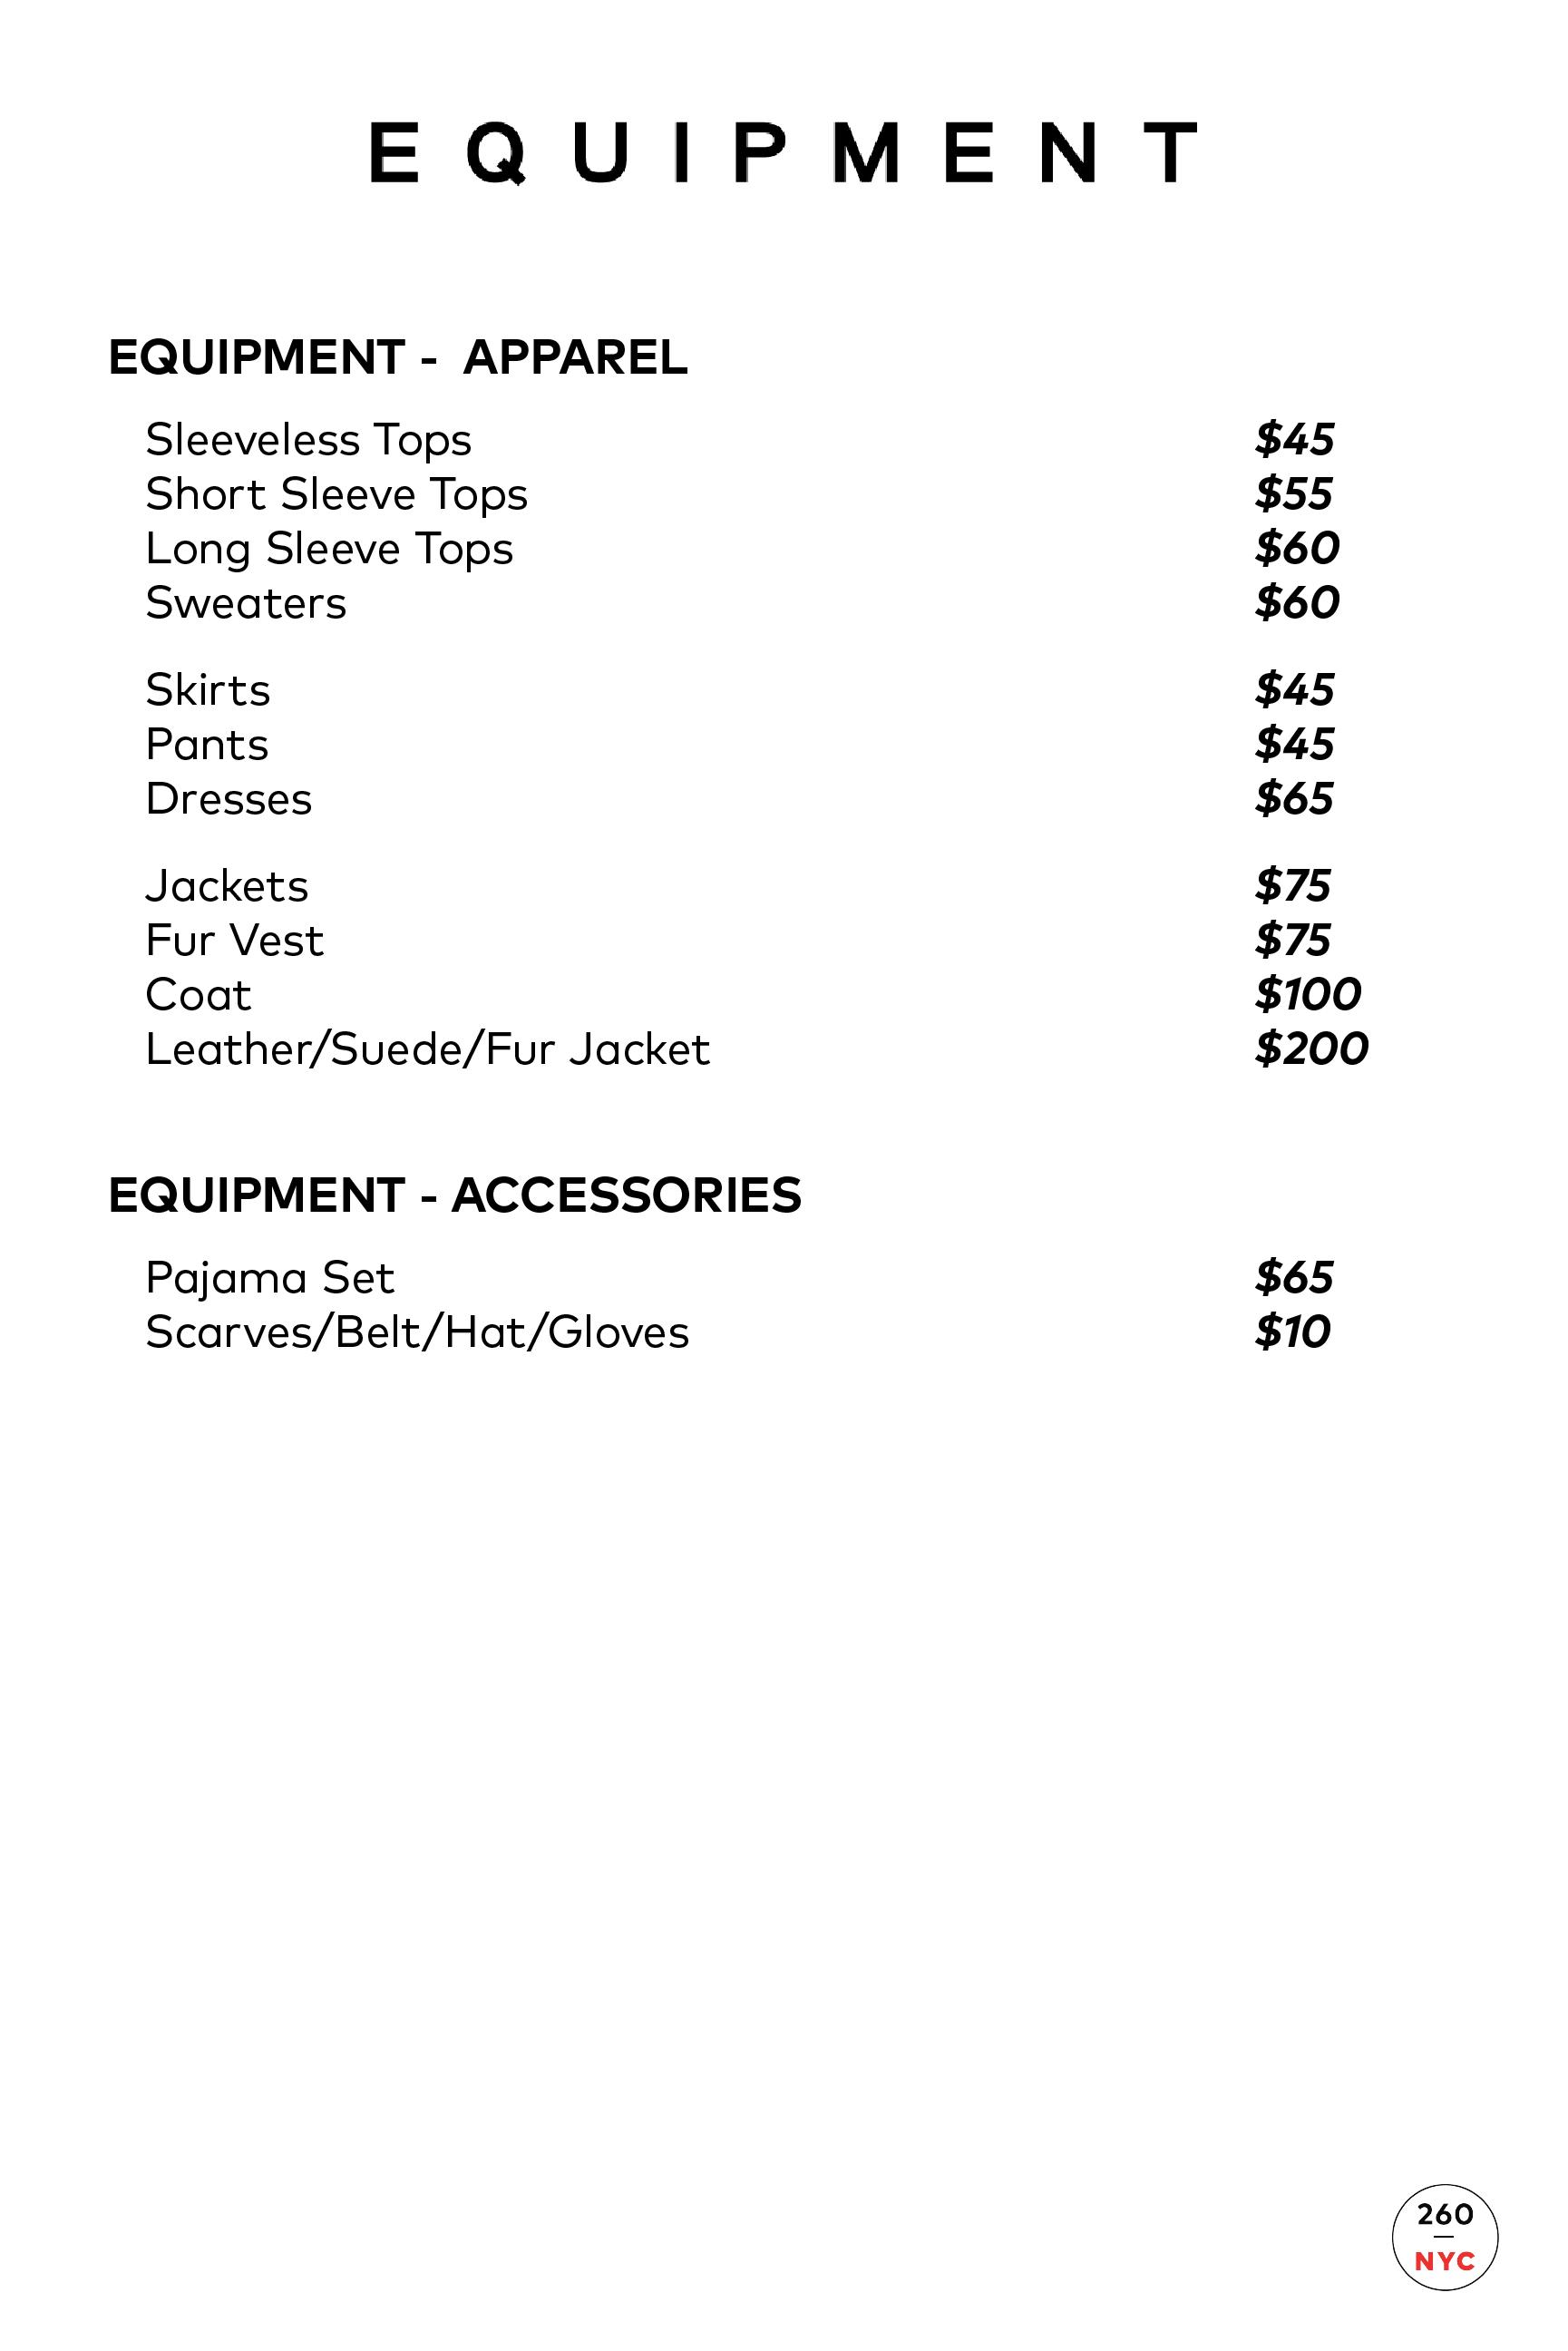 EquipmentJoieCurrentElliot_NYC_24x36-03.png